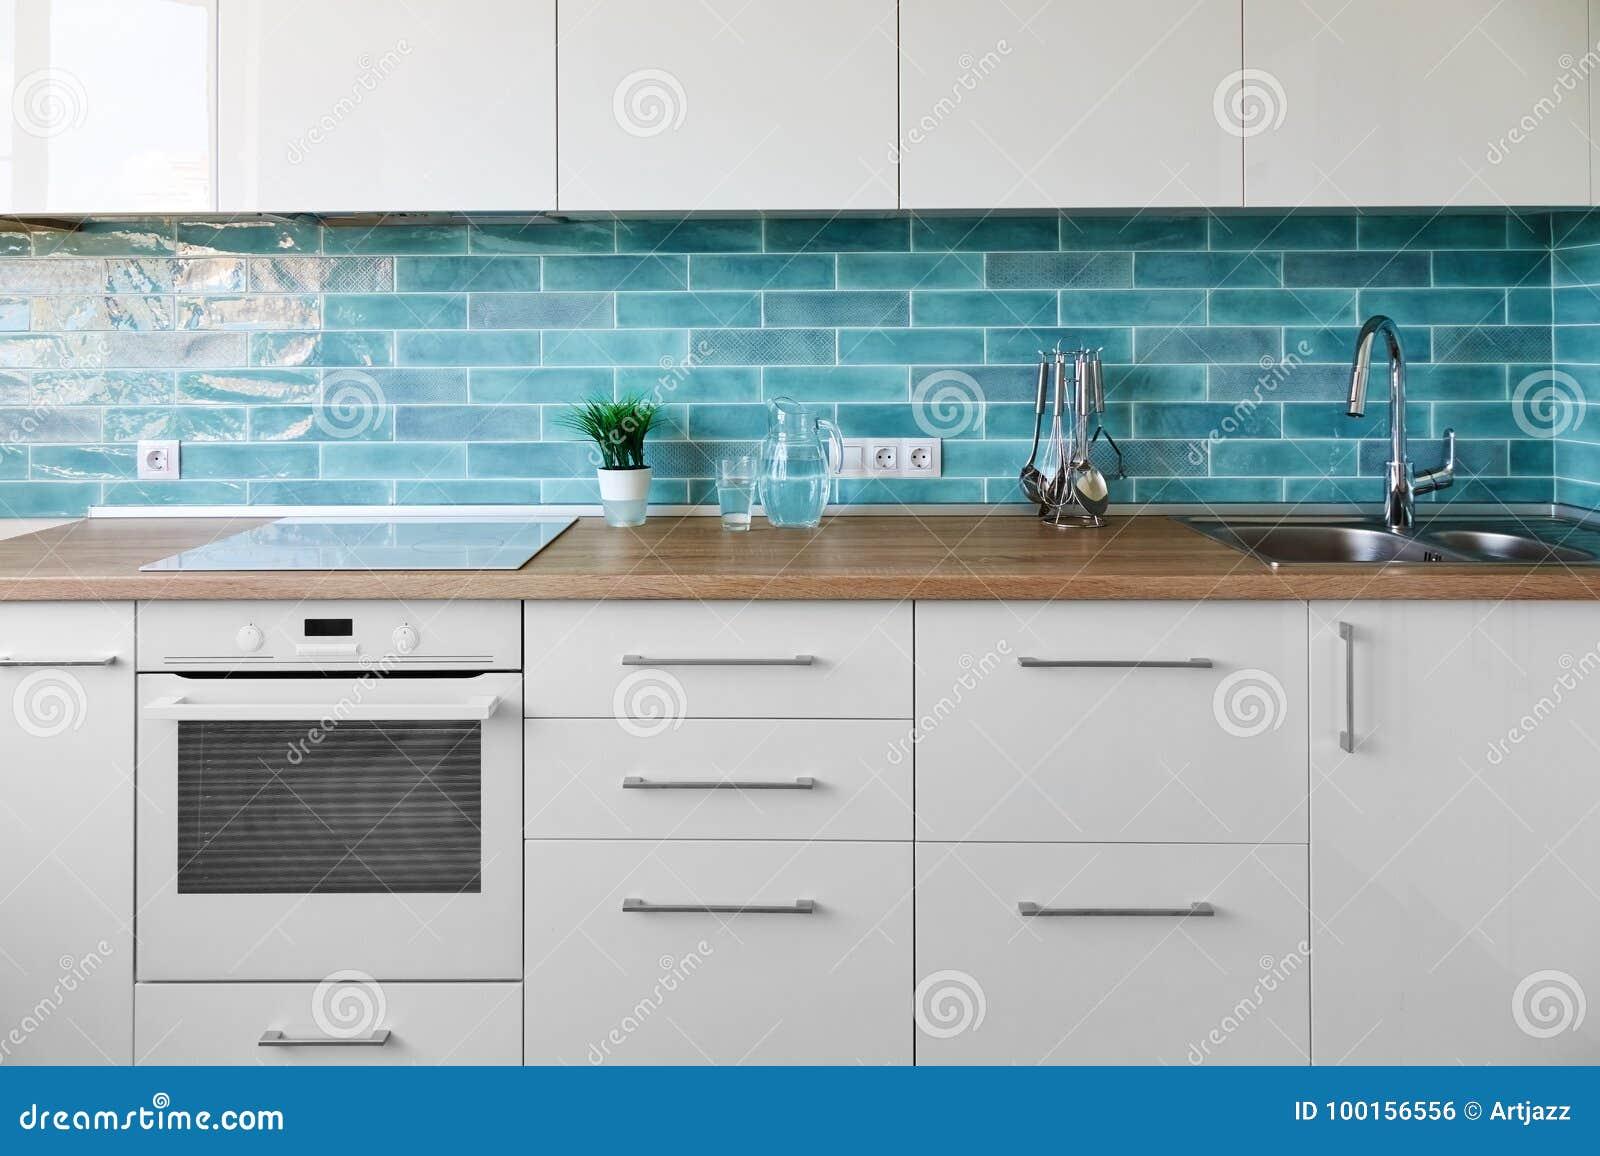 New Modern Kitchen Interior Stock Photo - Image of interior ...